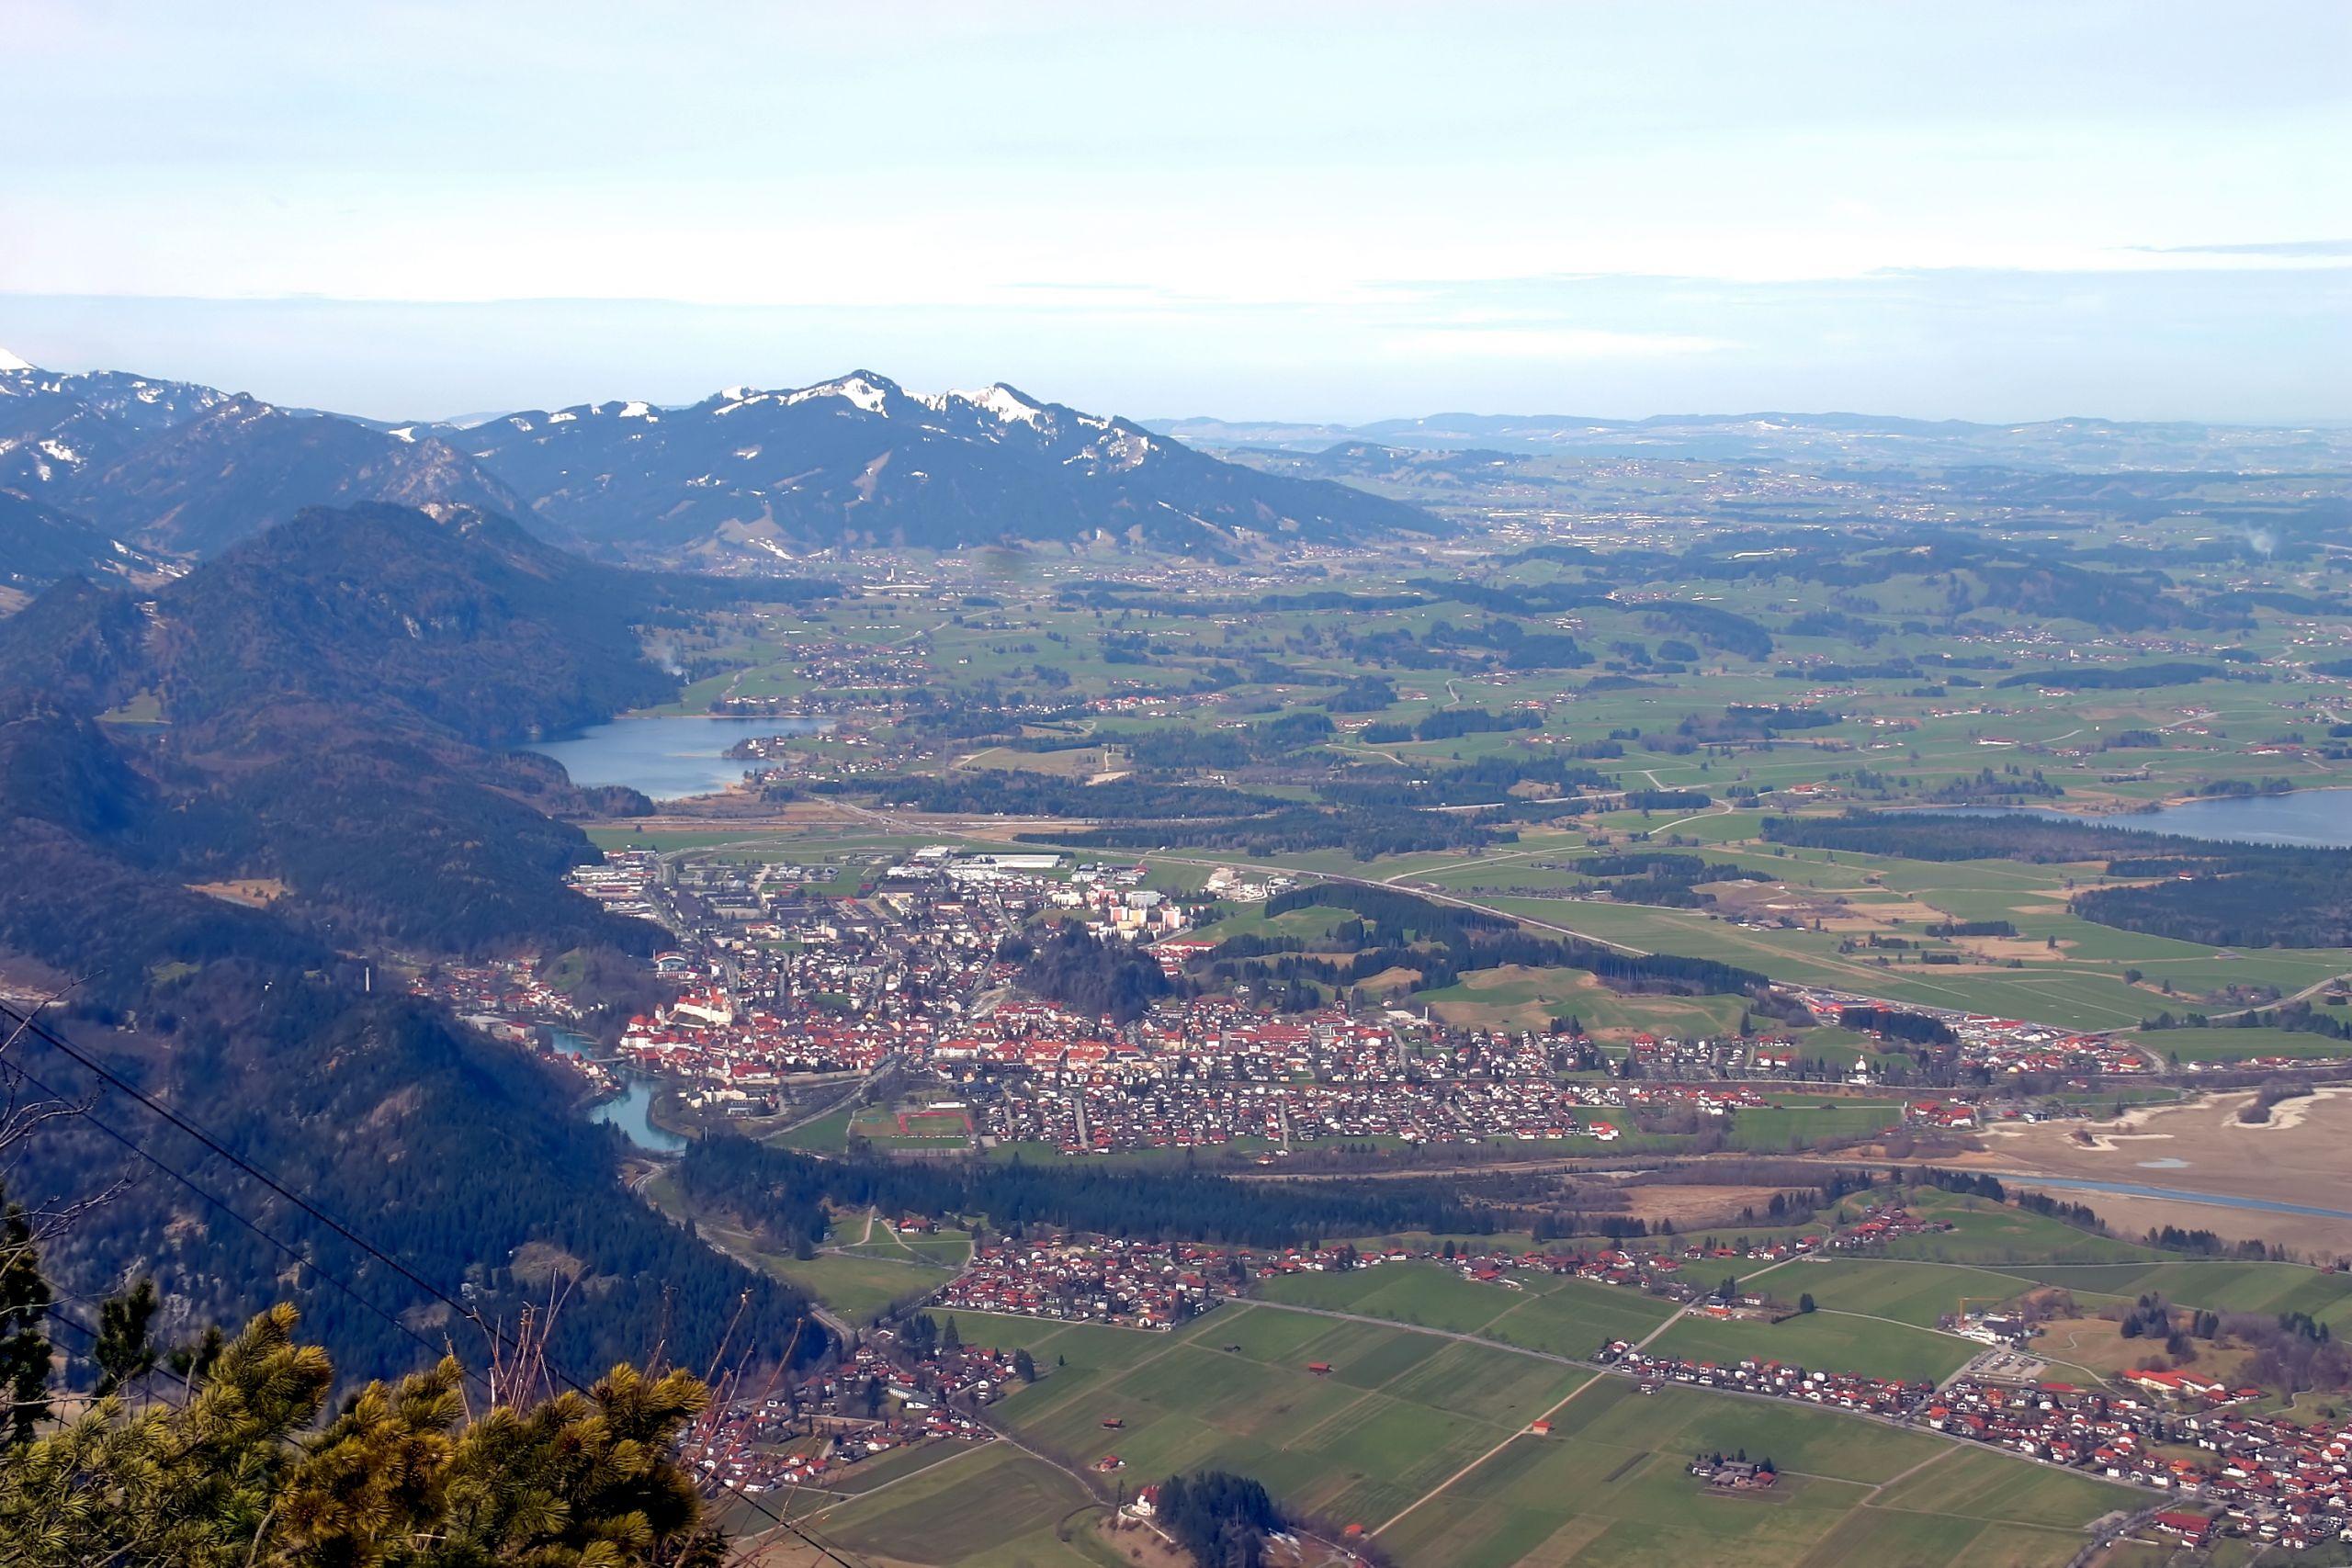 Füssen Blick über den Allgäu vom Tegelberg 3179 81